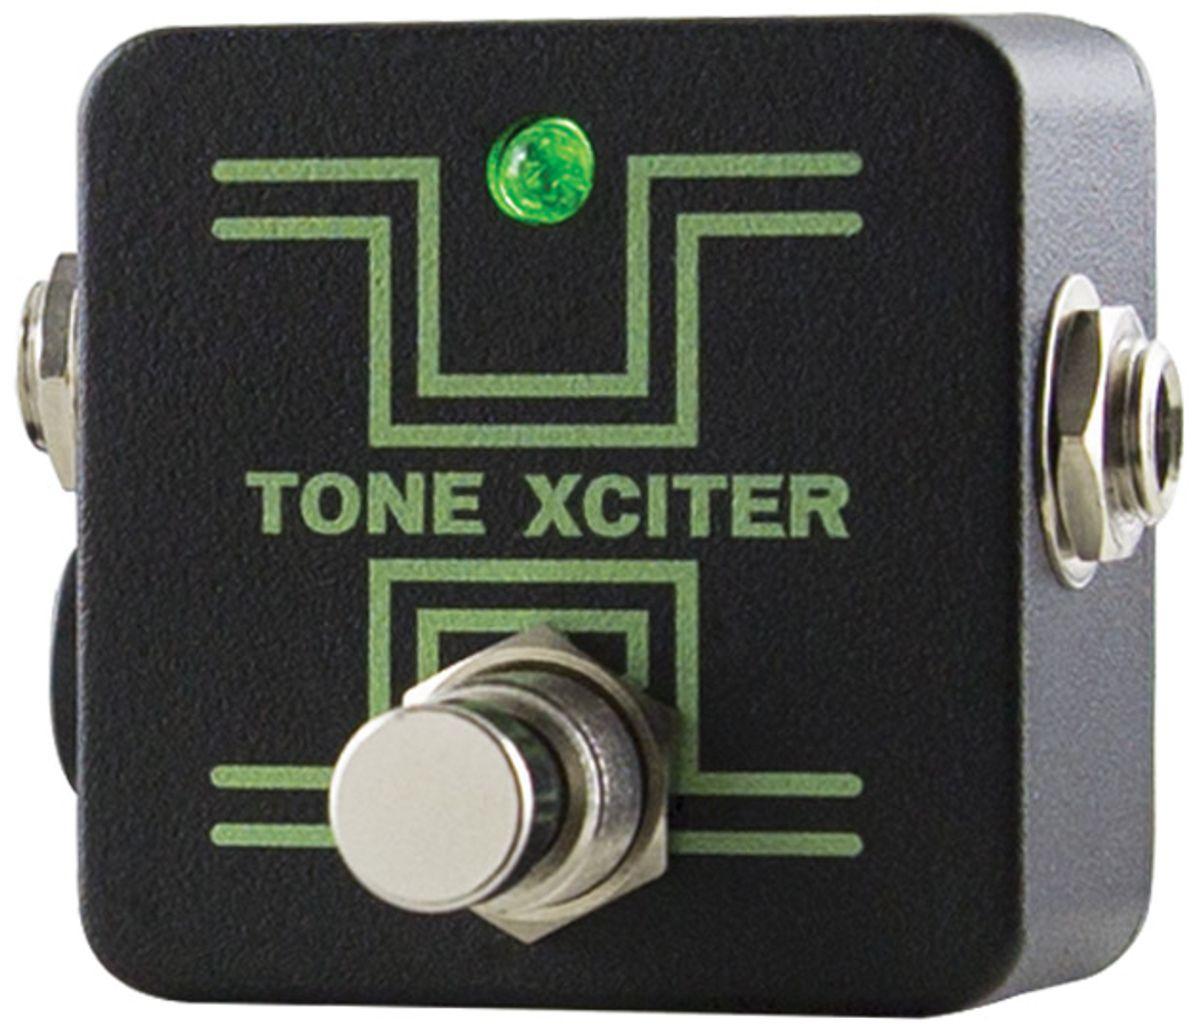 Quick Hit: Henretta Tone Xciter Review